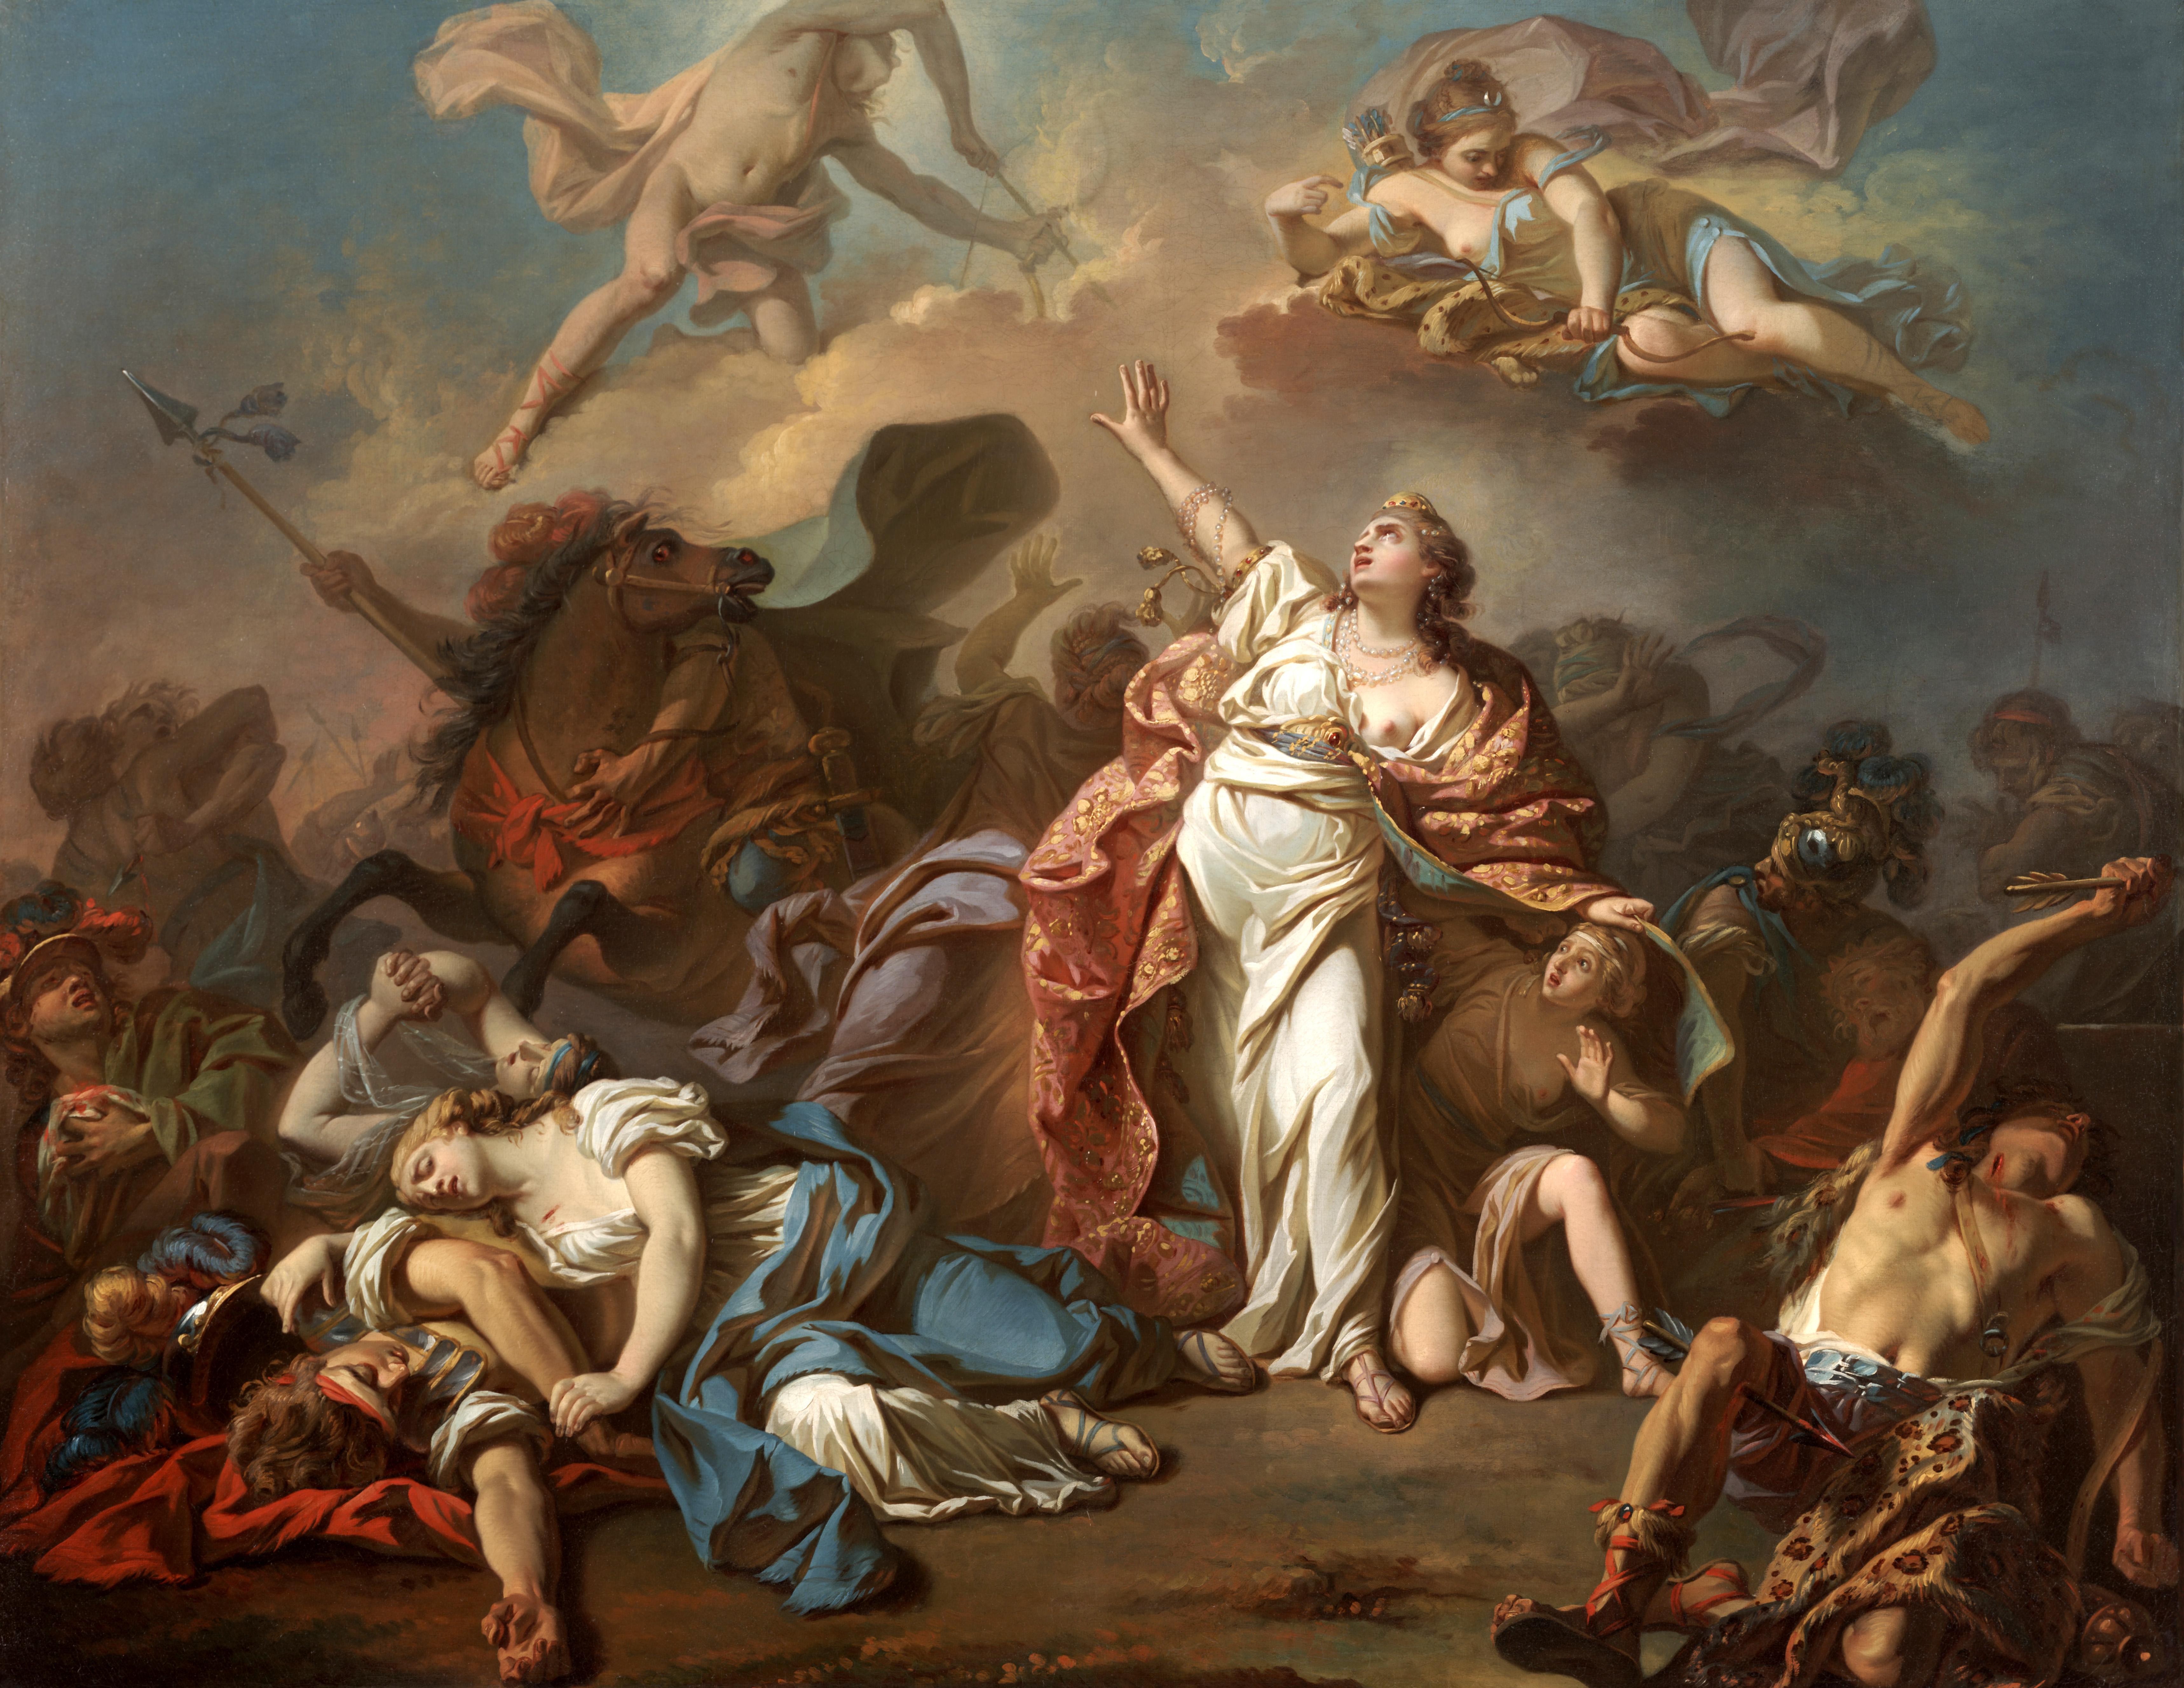 https://upload.wikimedia.org/wikipedia/commons/6/6c/Niobe_JacquesLouisDavid_1772_Dallas_Museum_of_Art.jpg